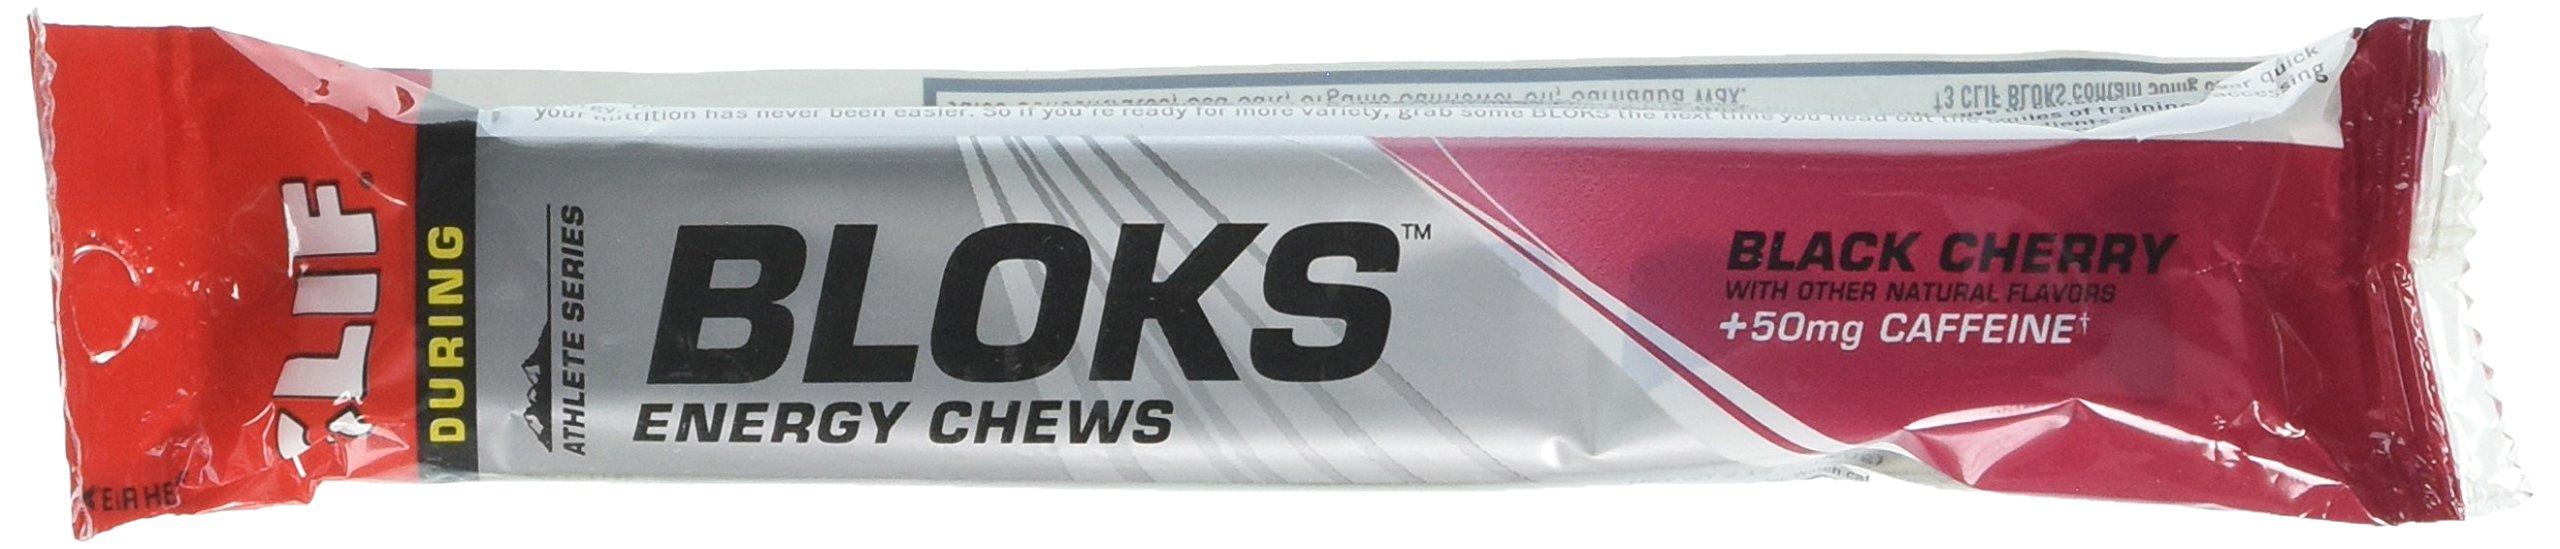 Clif Bloks Energy Chews - 18 Pack - Black Cherry +50mg Caffeine